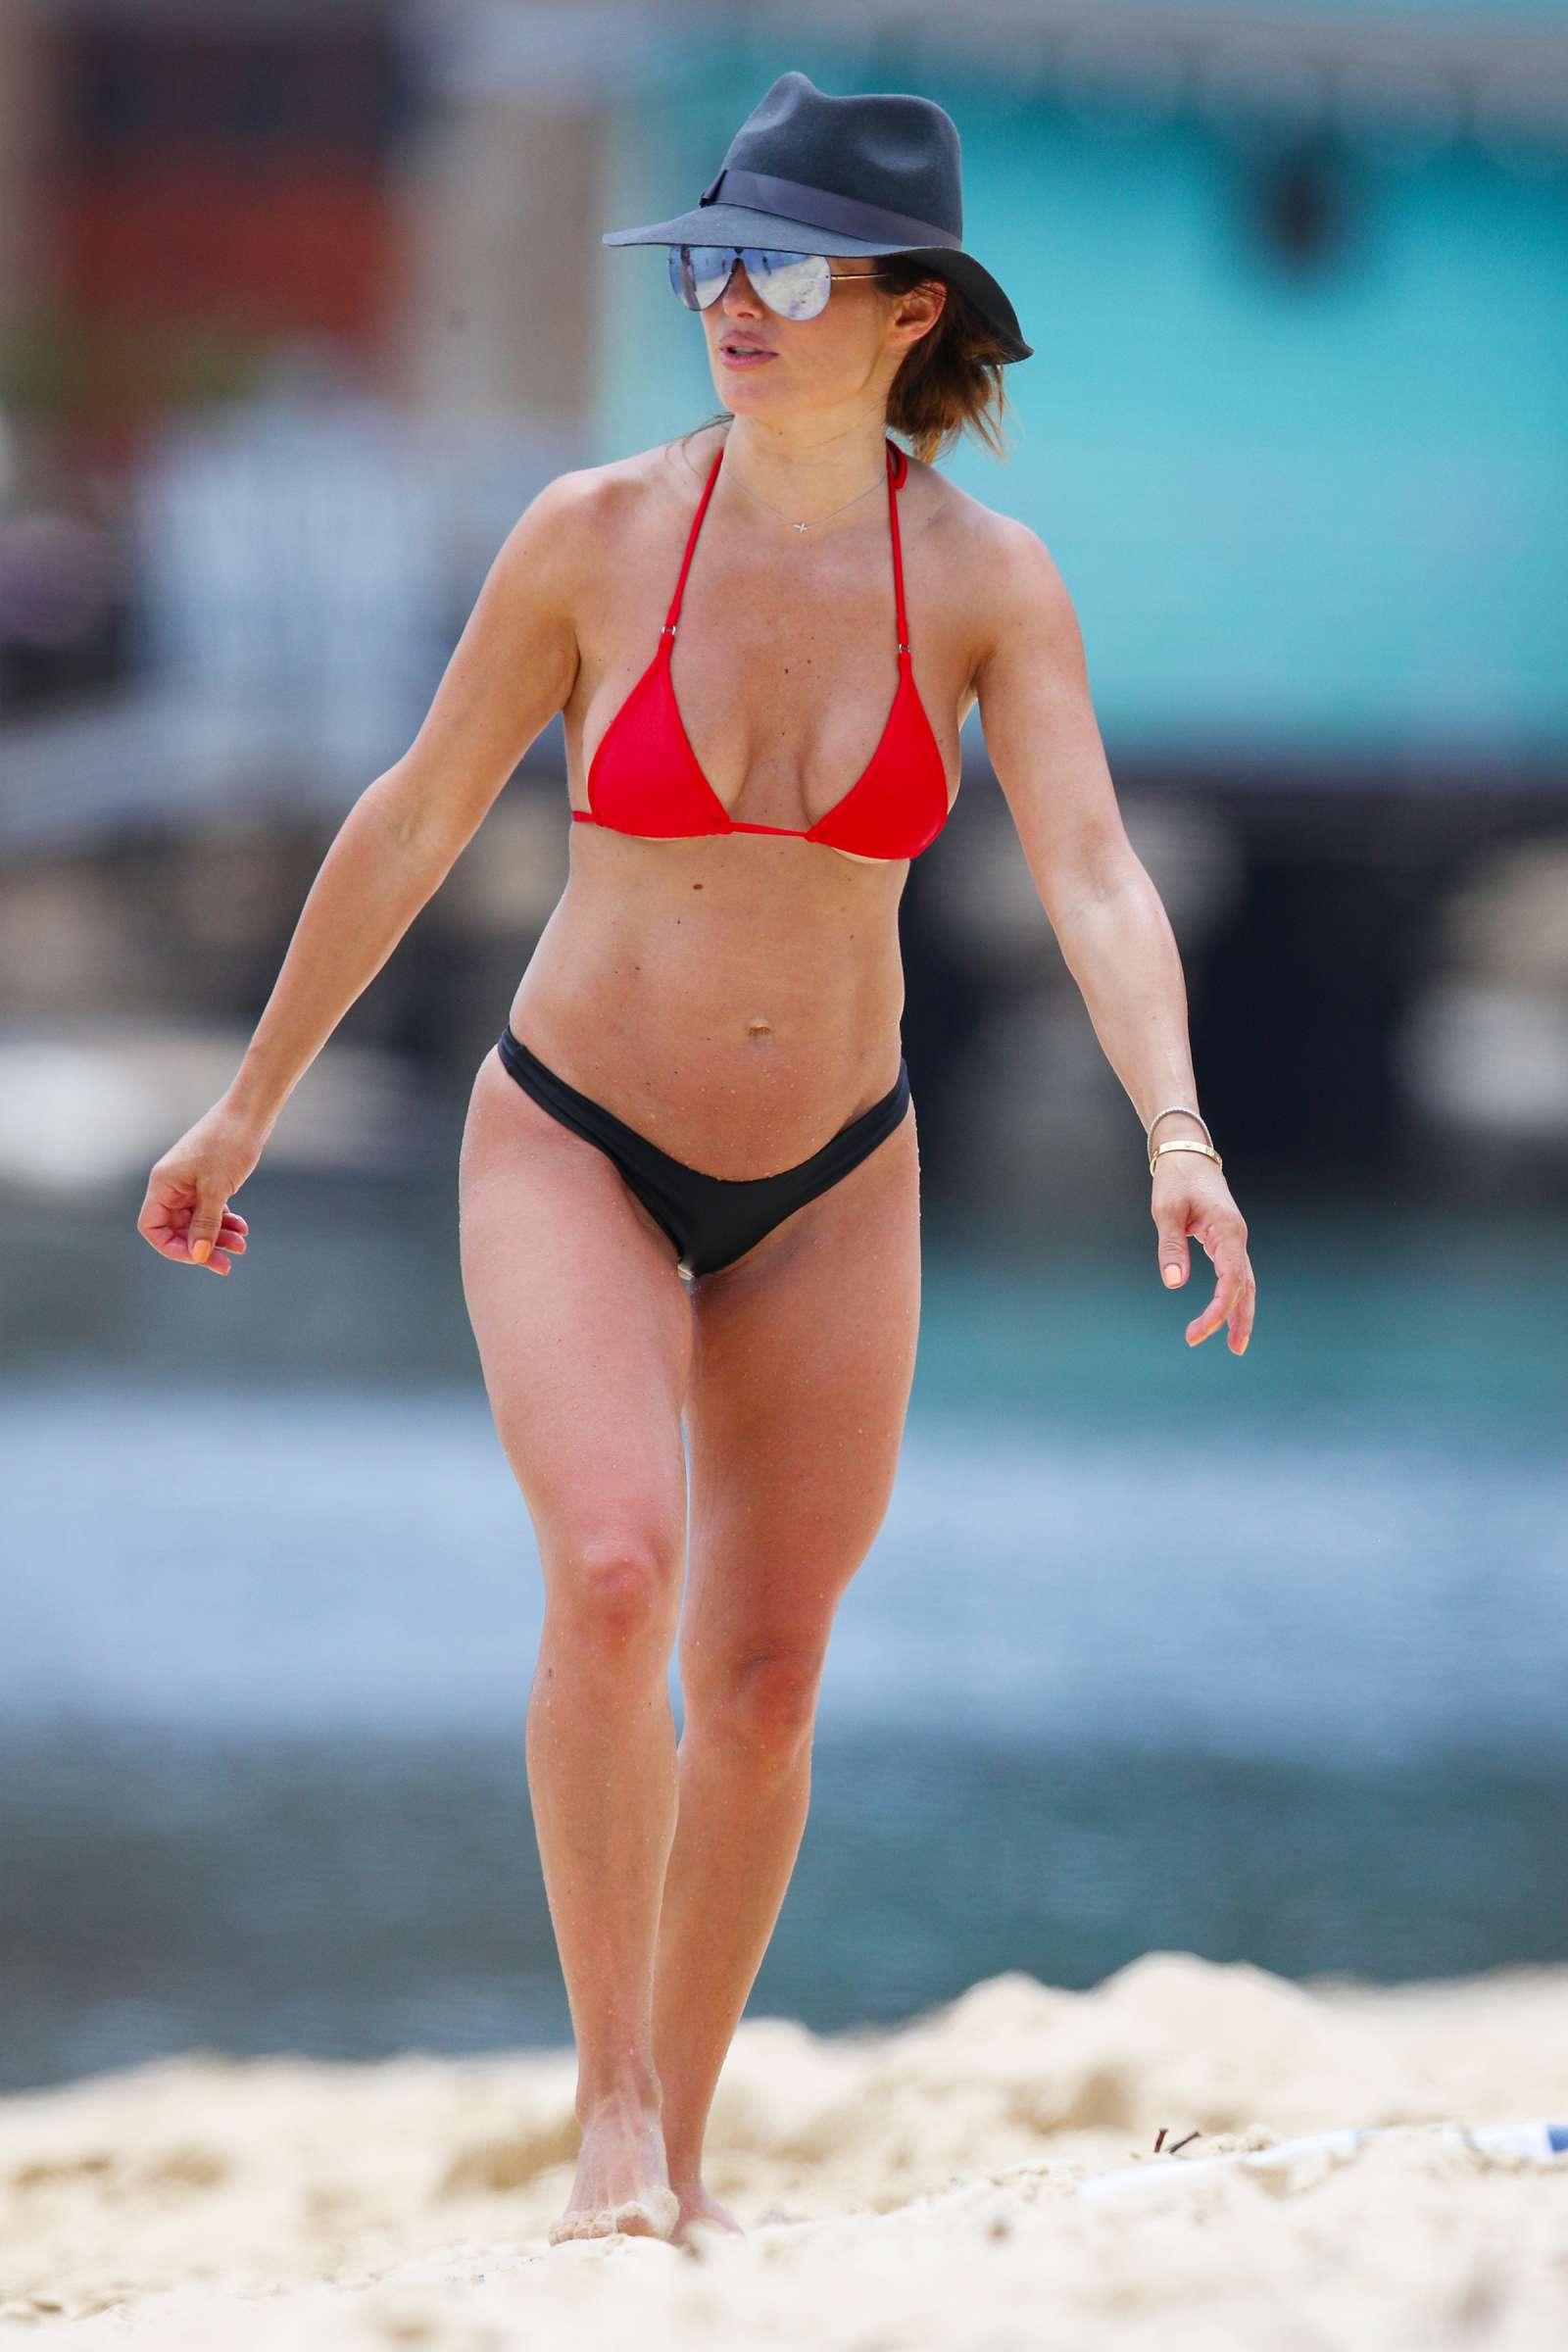 Ada Nicodemou 2019 : Ada Nicodemou in Black and Red Bikini 2019 -09